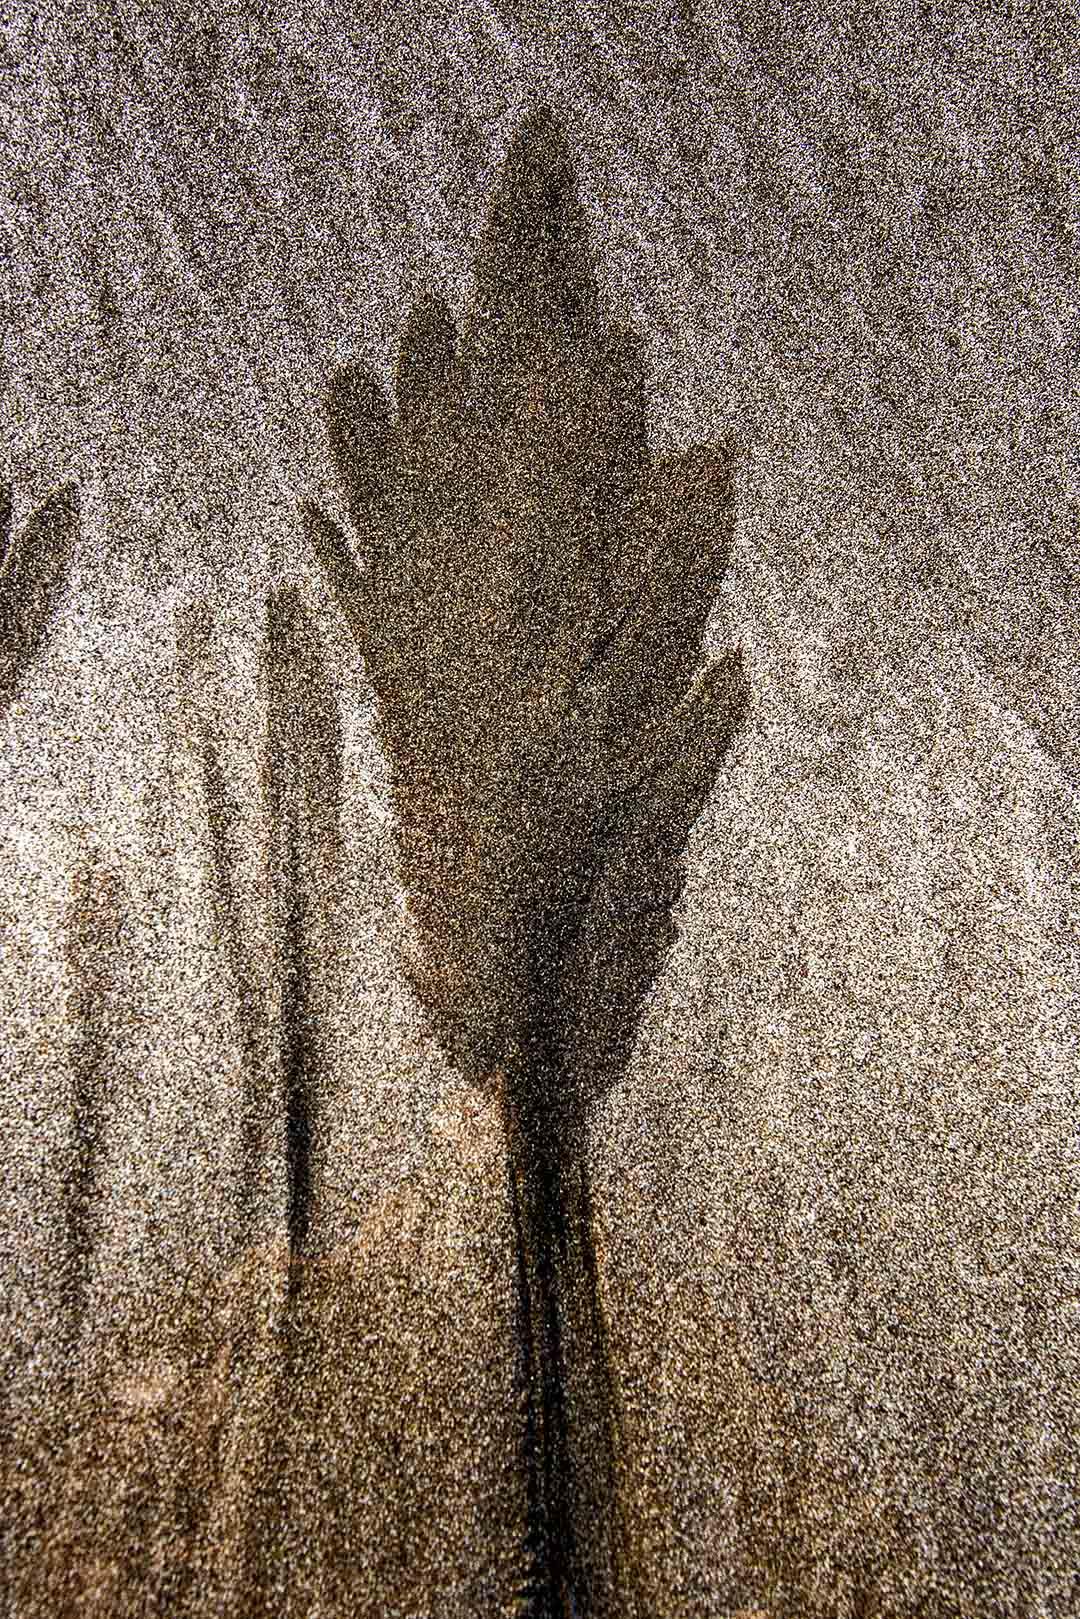 Sand_1083